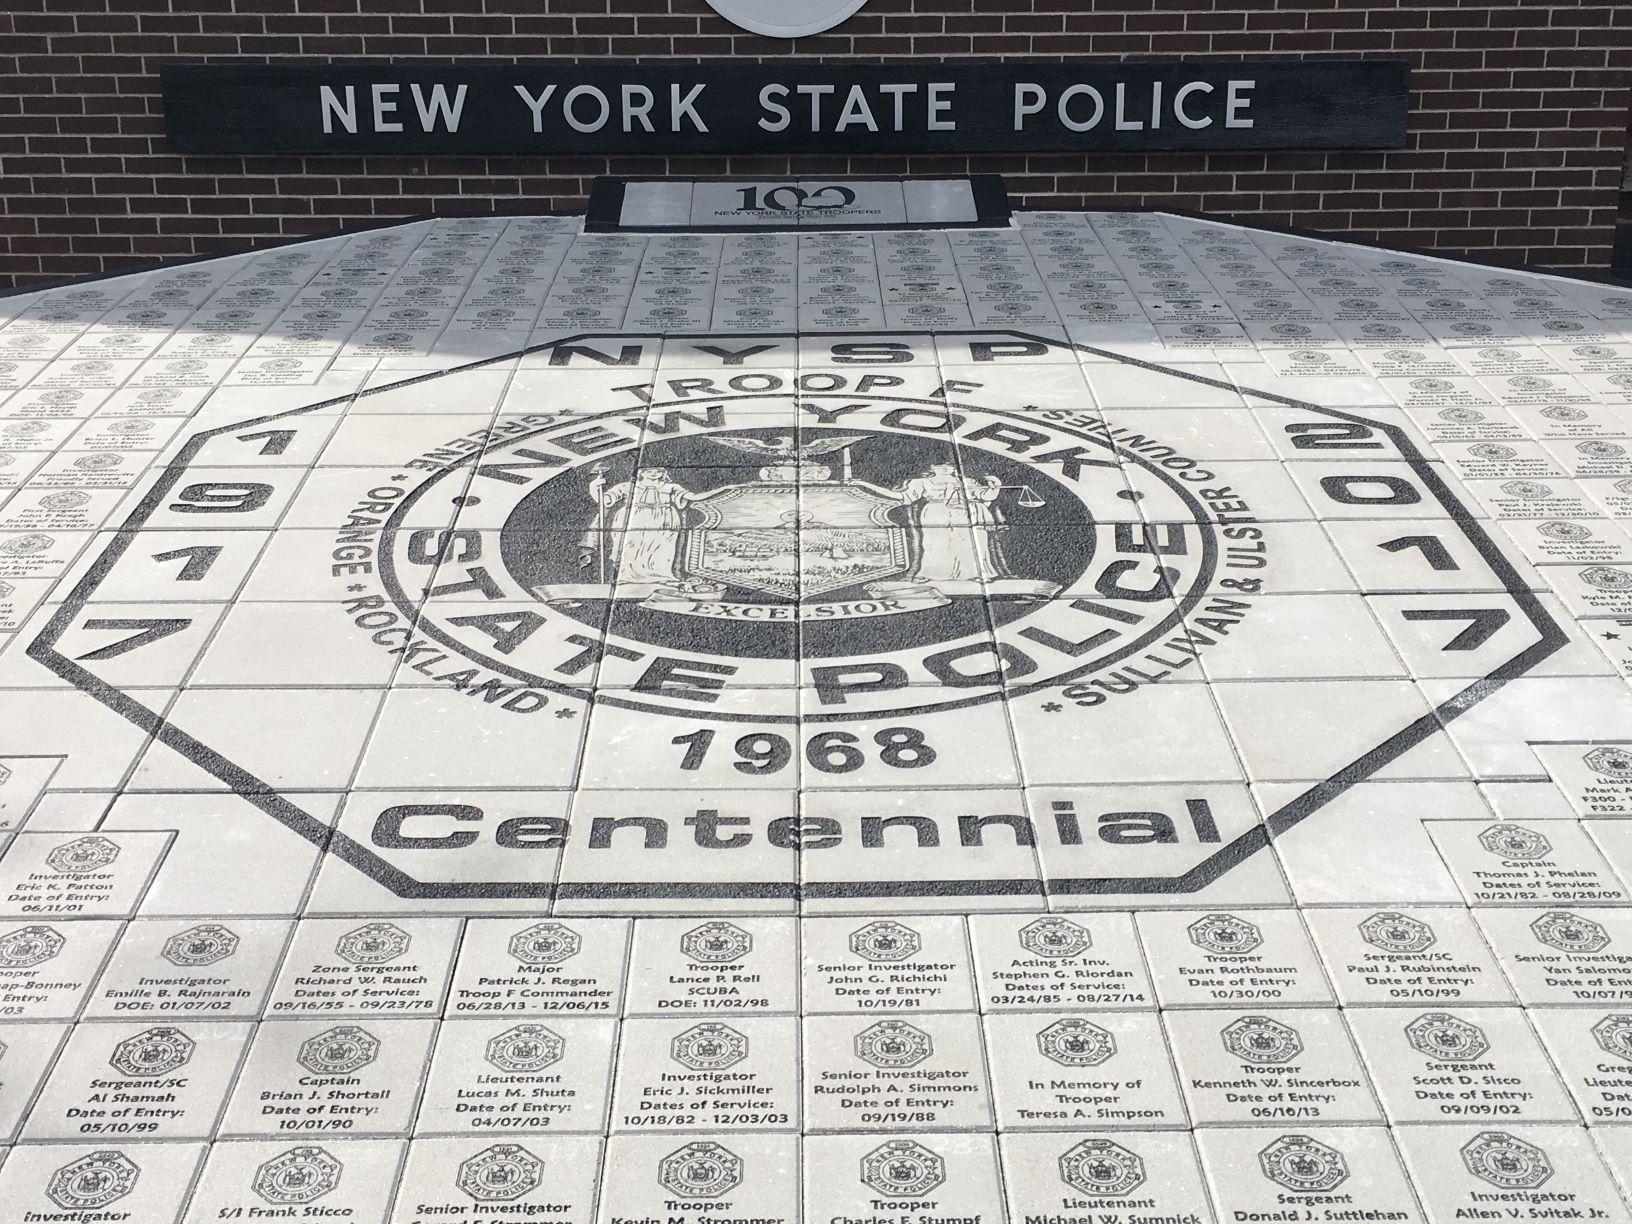 Engraved Bricks For Memorial NY State Police